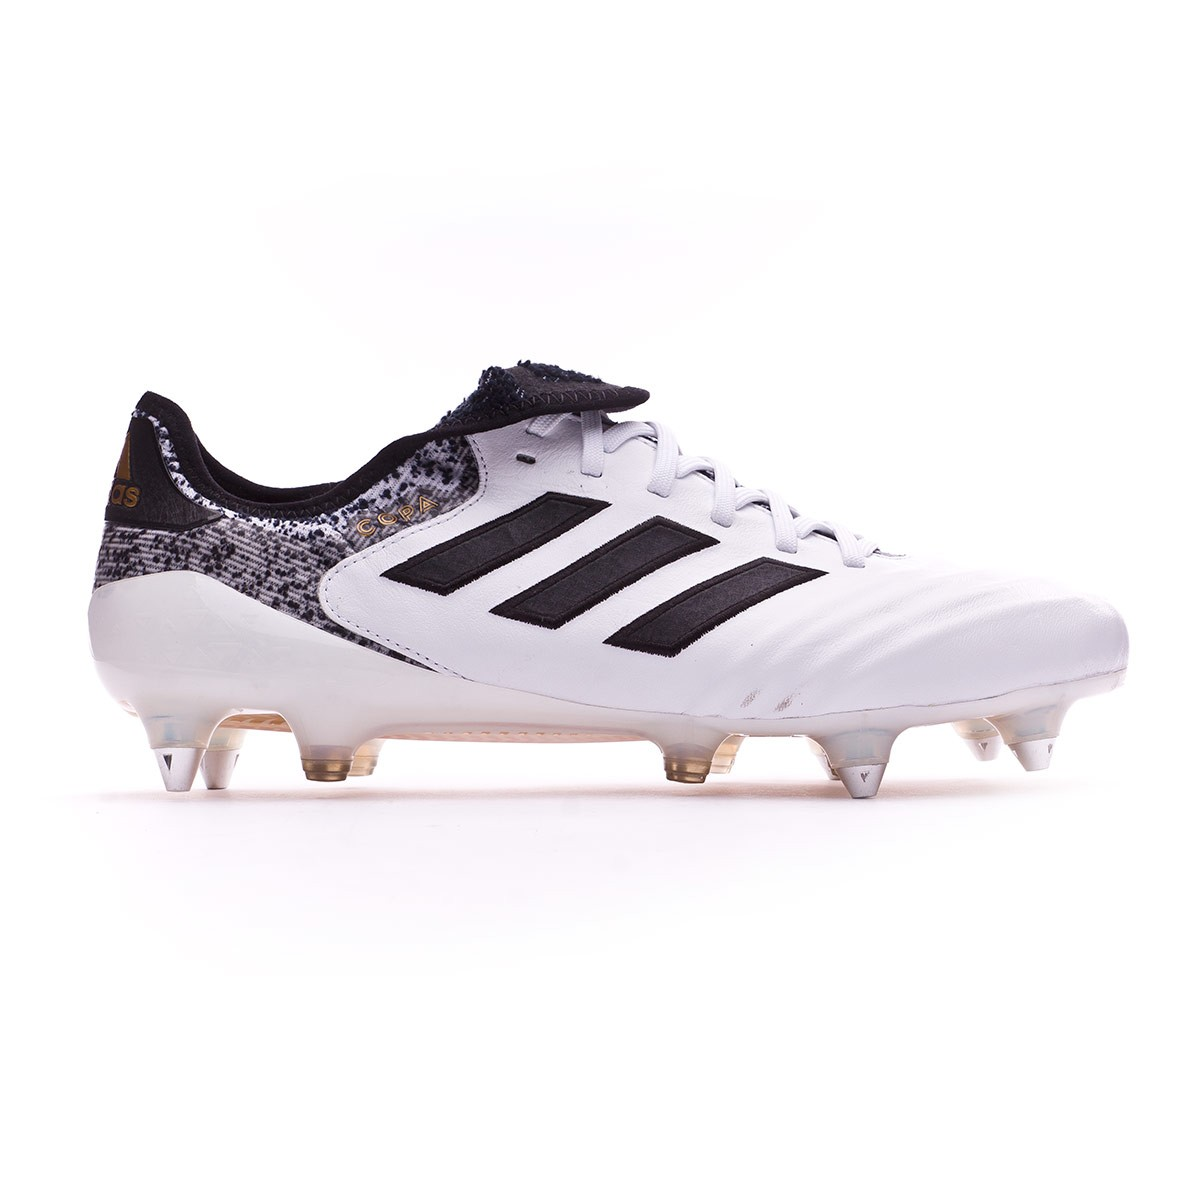 2018 Adidas Copa 18.1 Football Boots *As New* SG